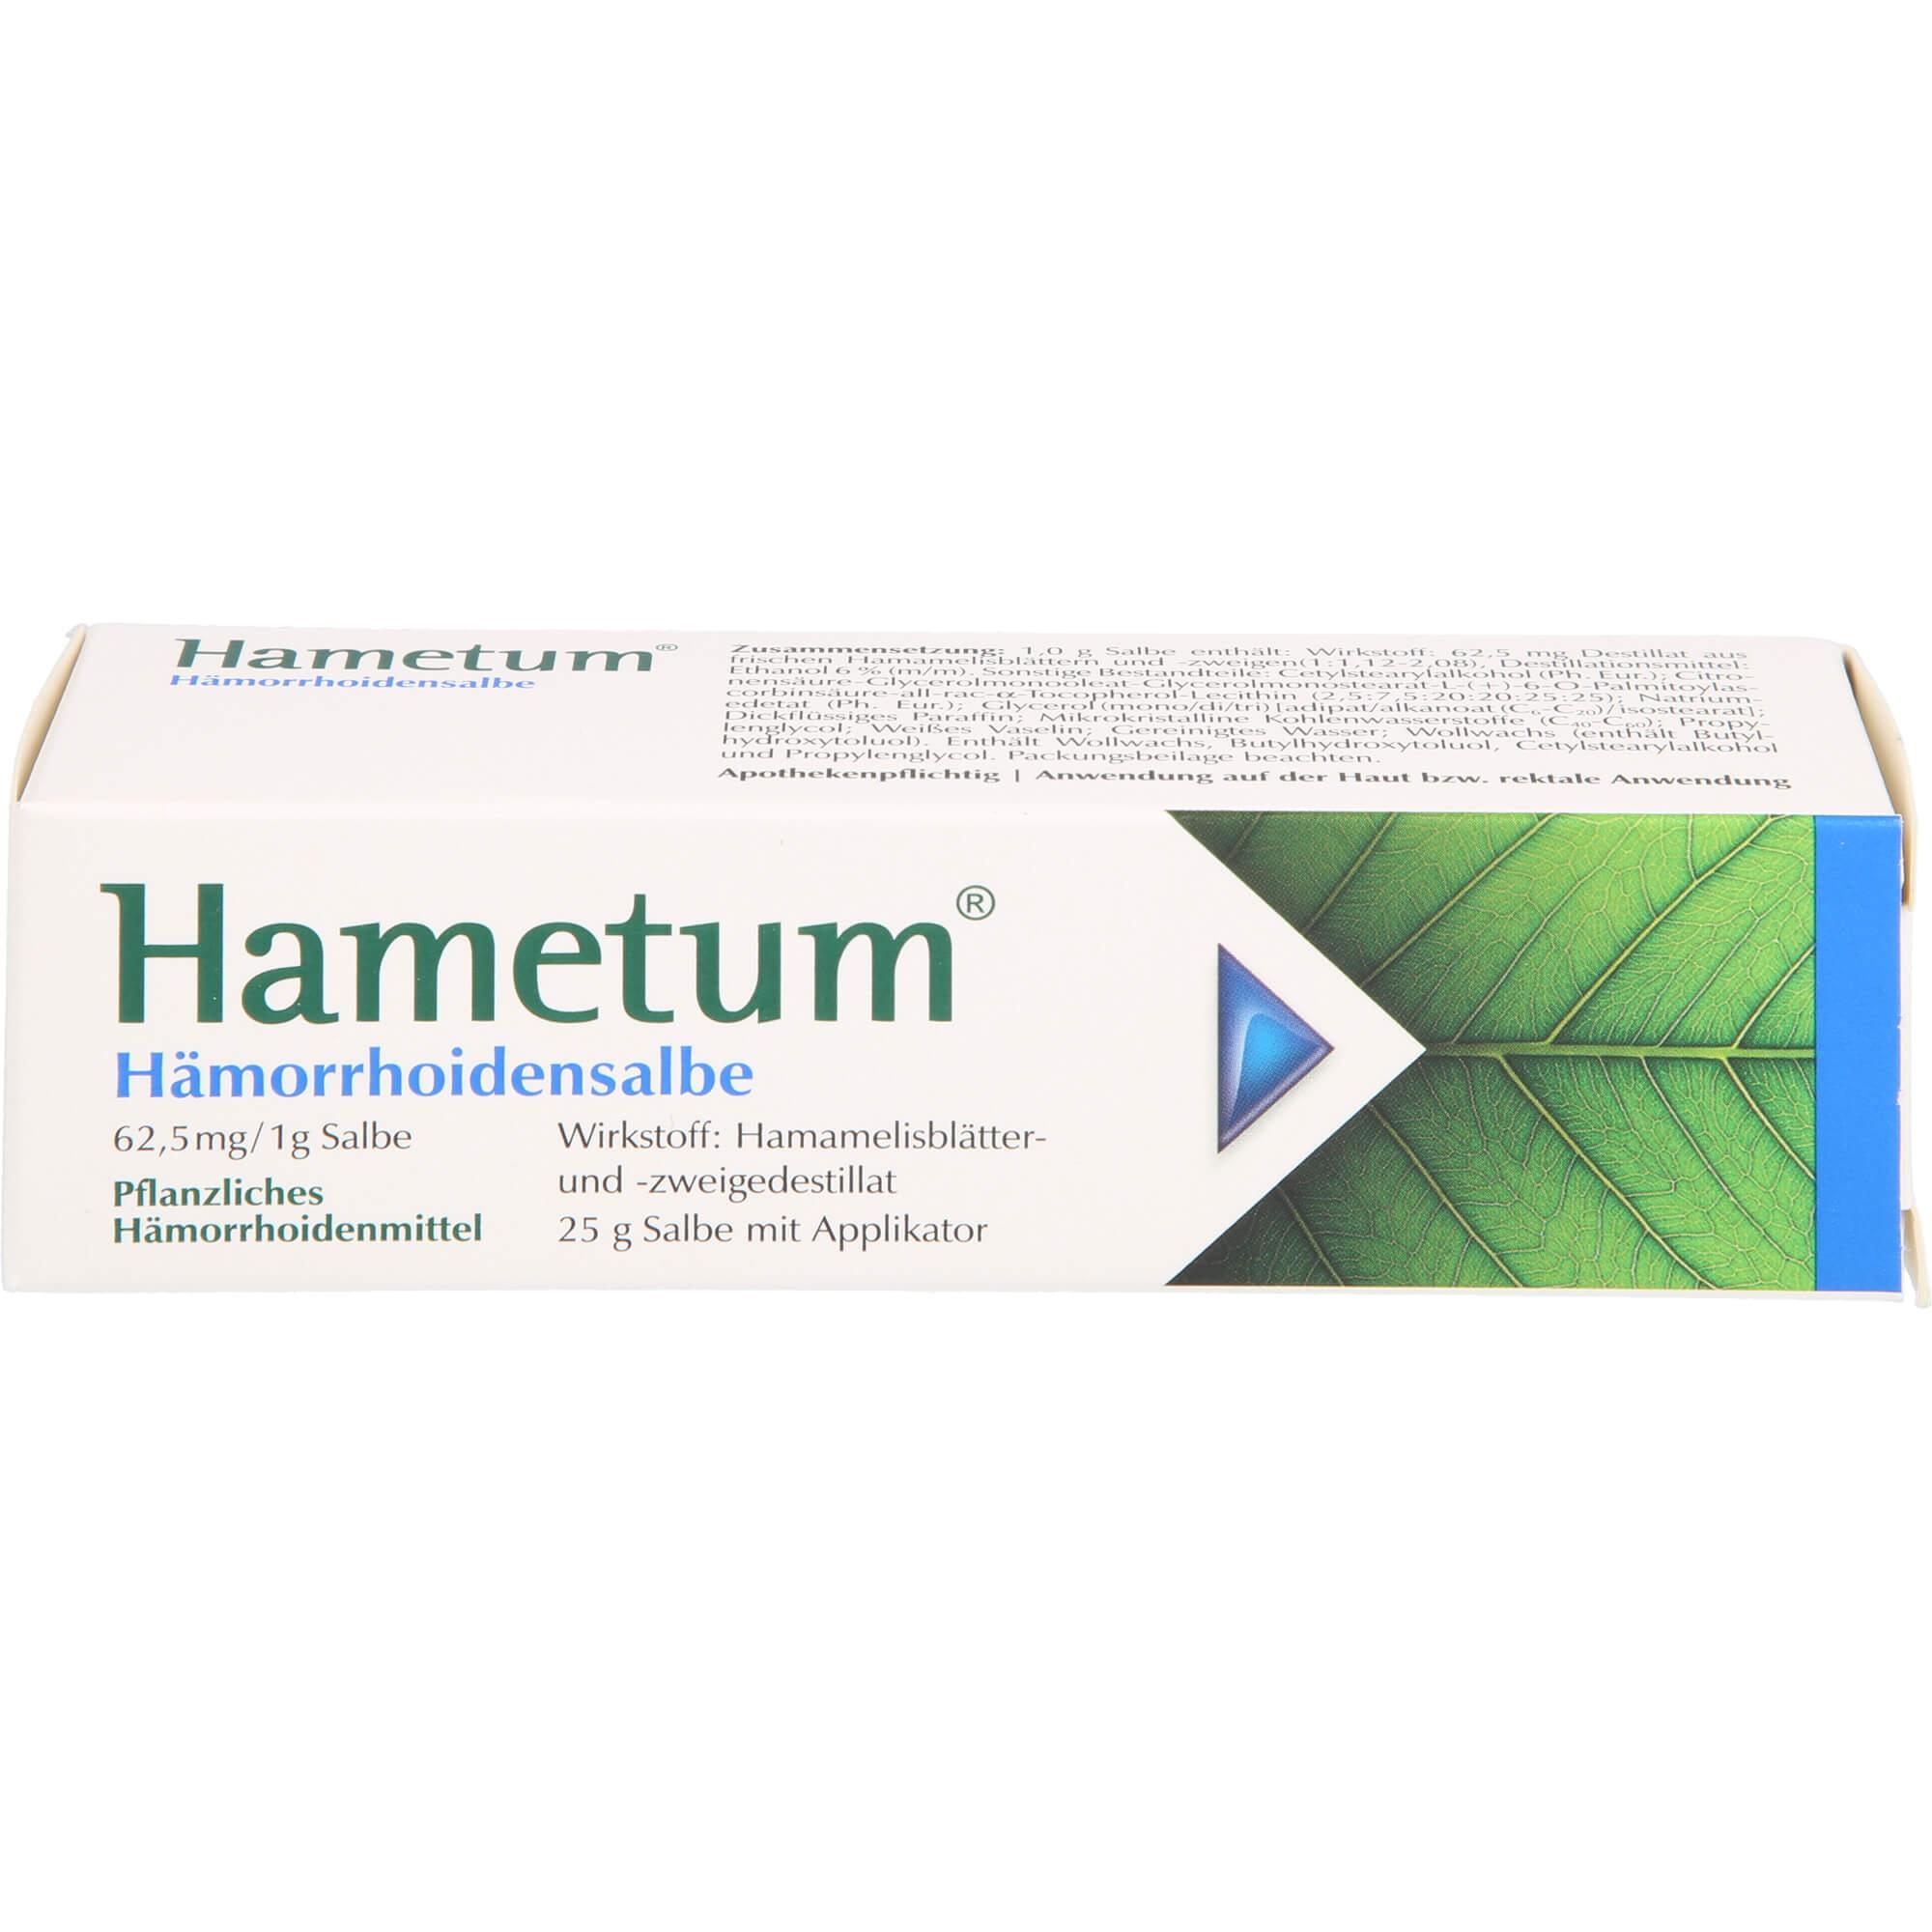 HAMETUM-Haemorrhoiden-Salbe